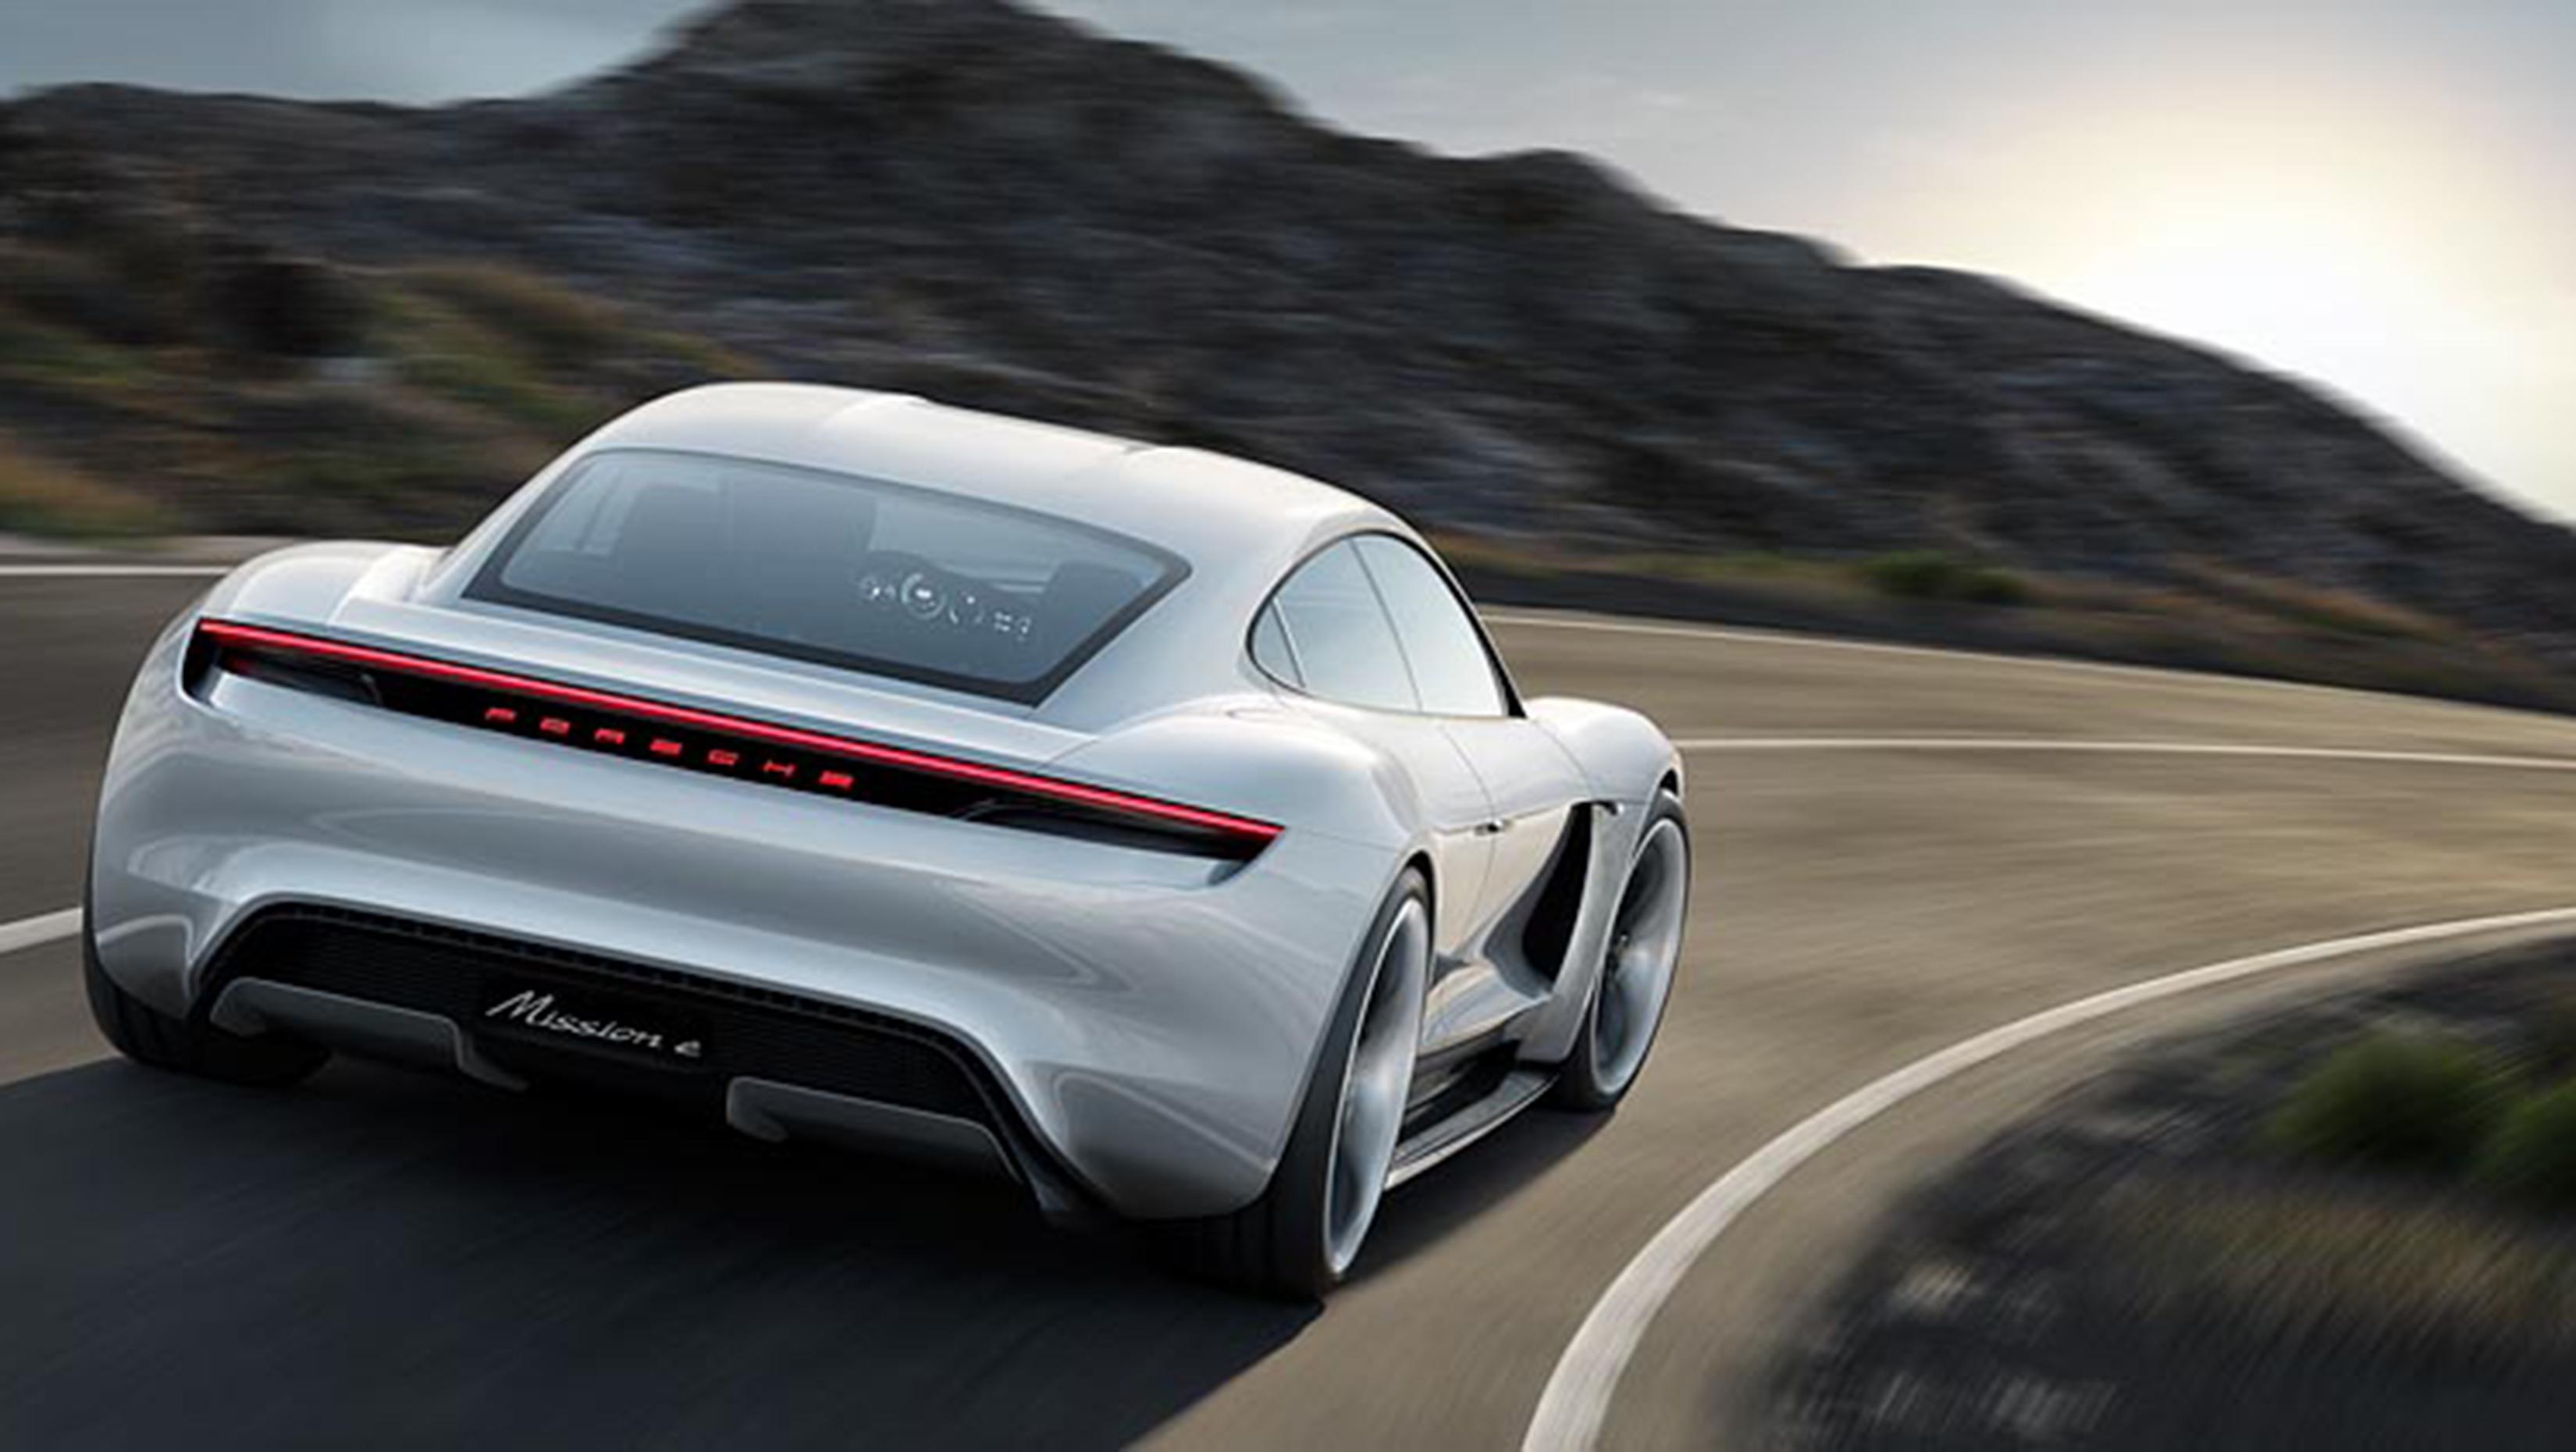 Porsche is Spending $1 Billion on Its Electric Sports Car